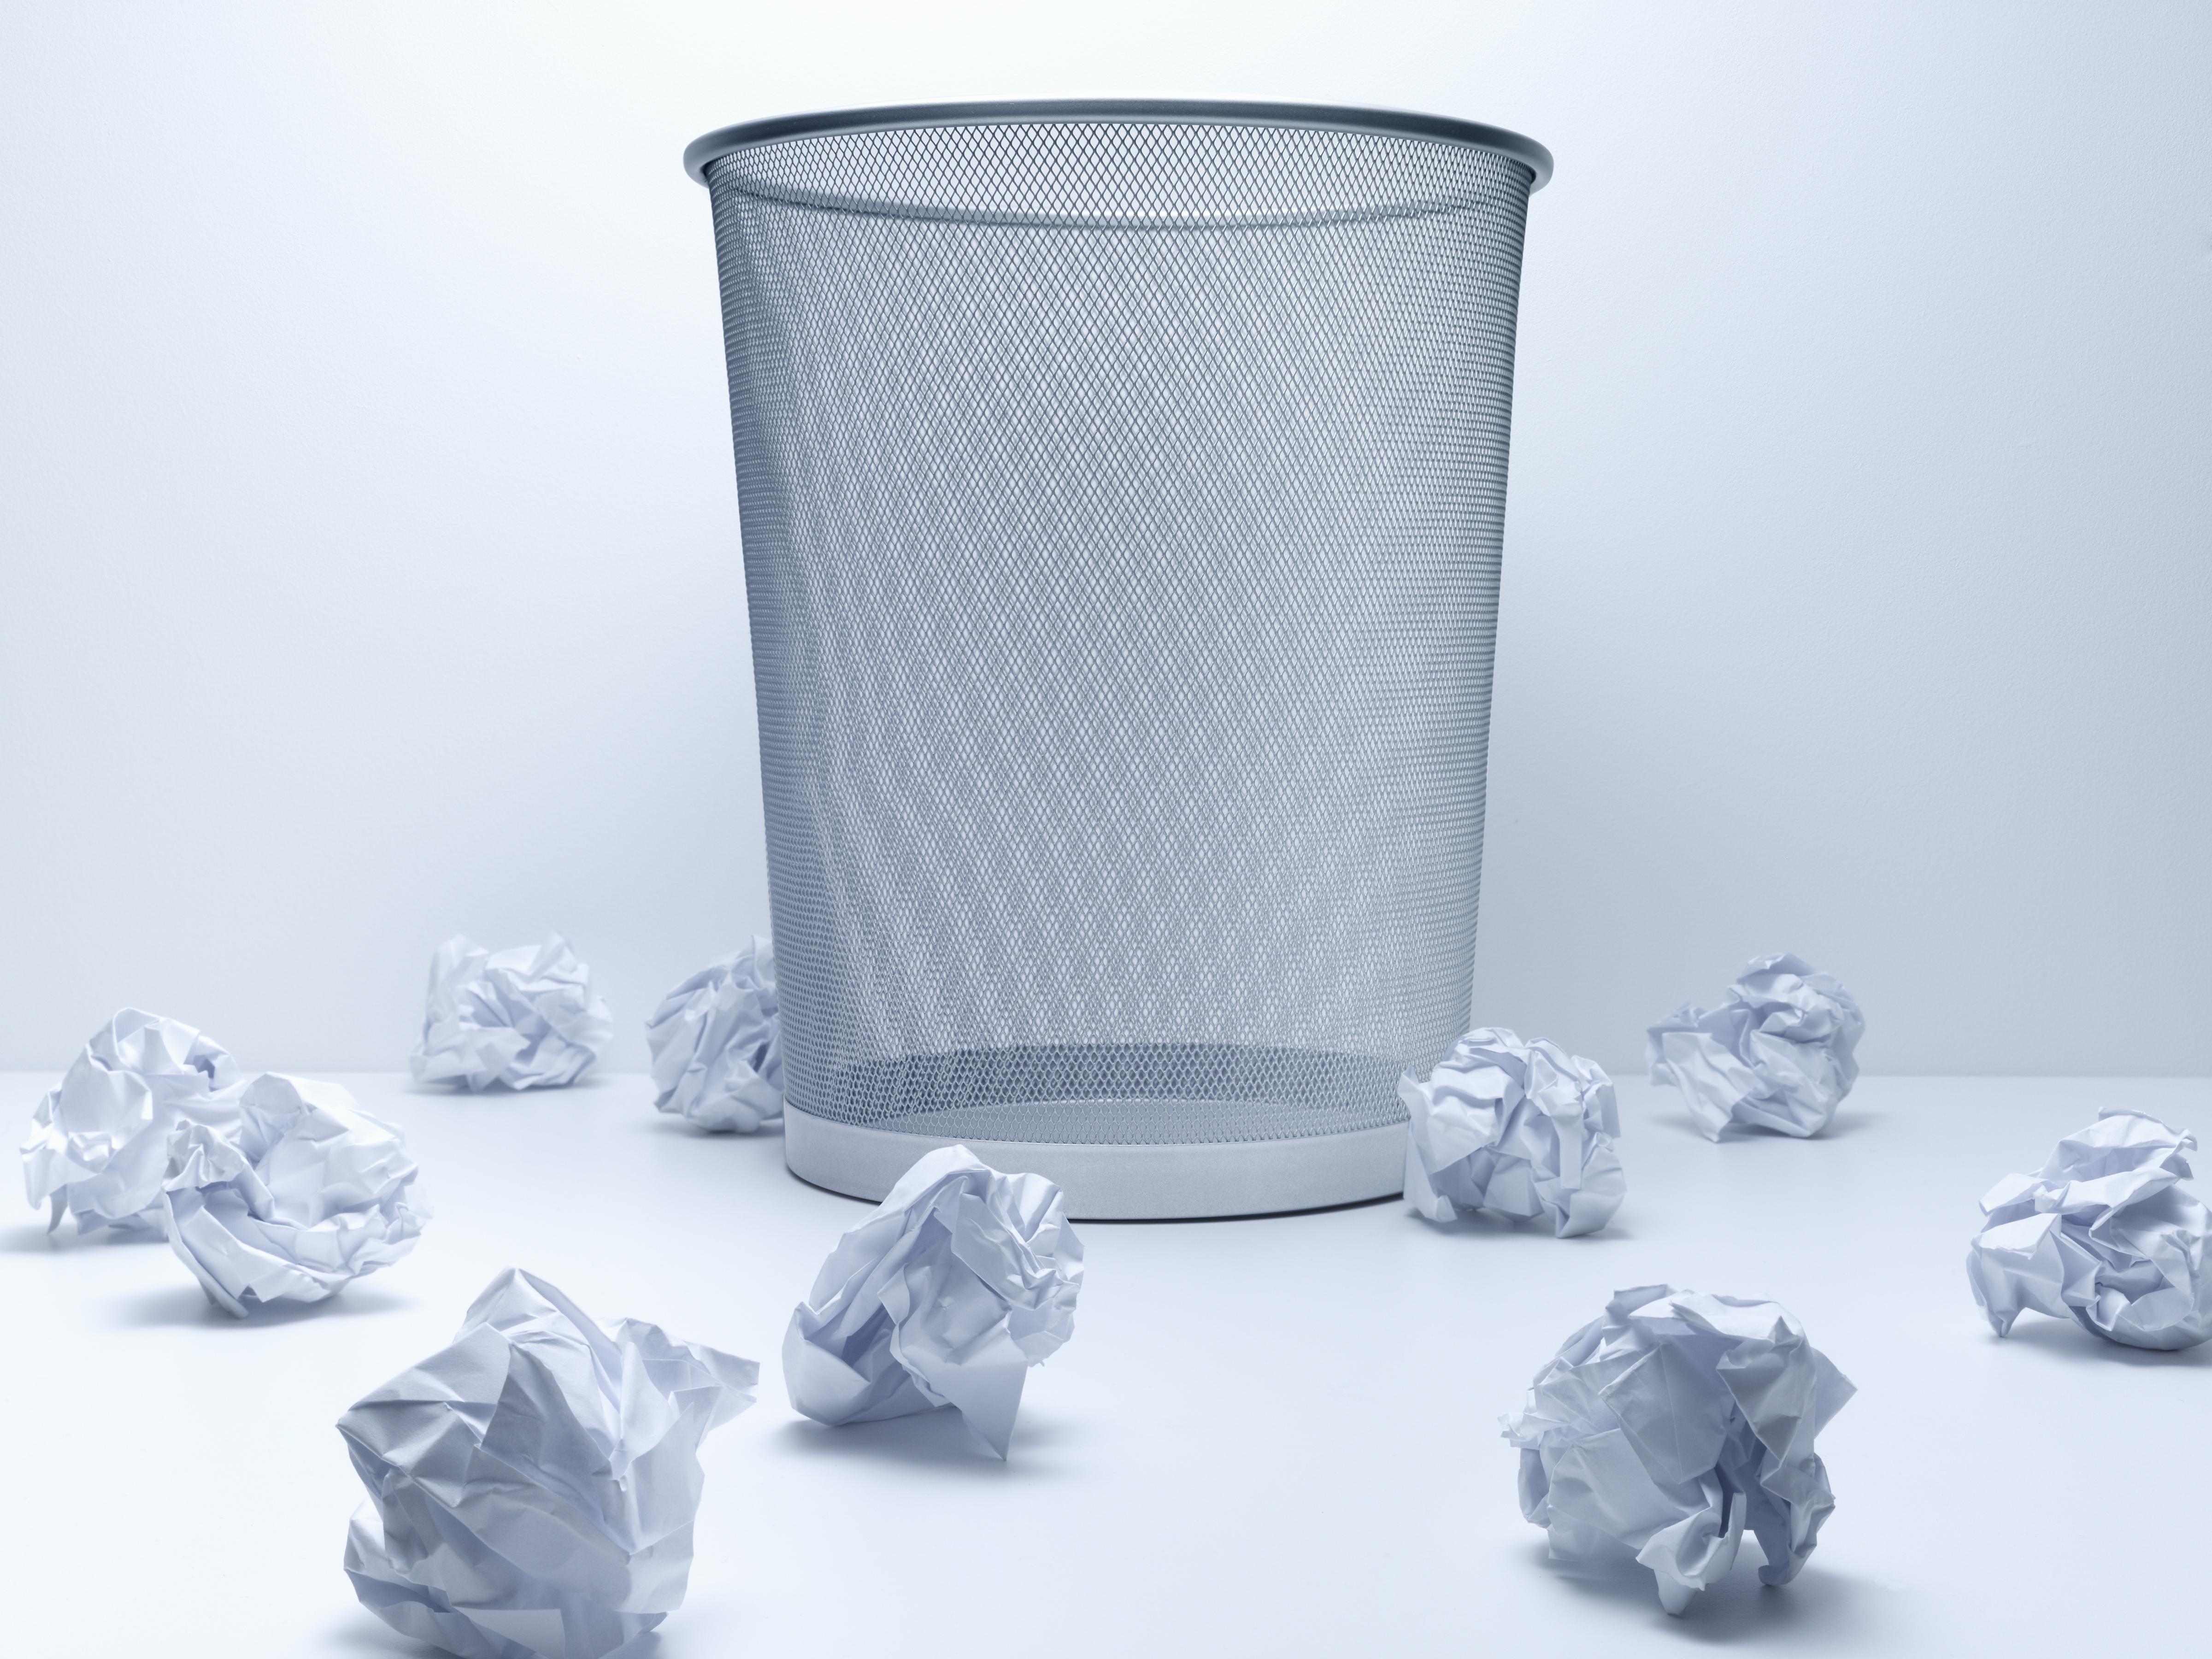 Crumpled balls of paper beside wastebasket